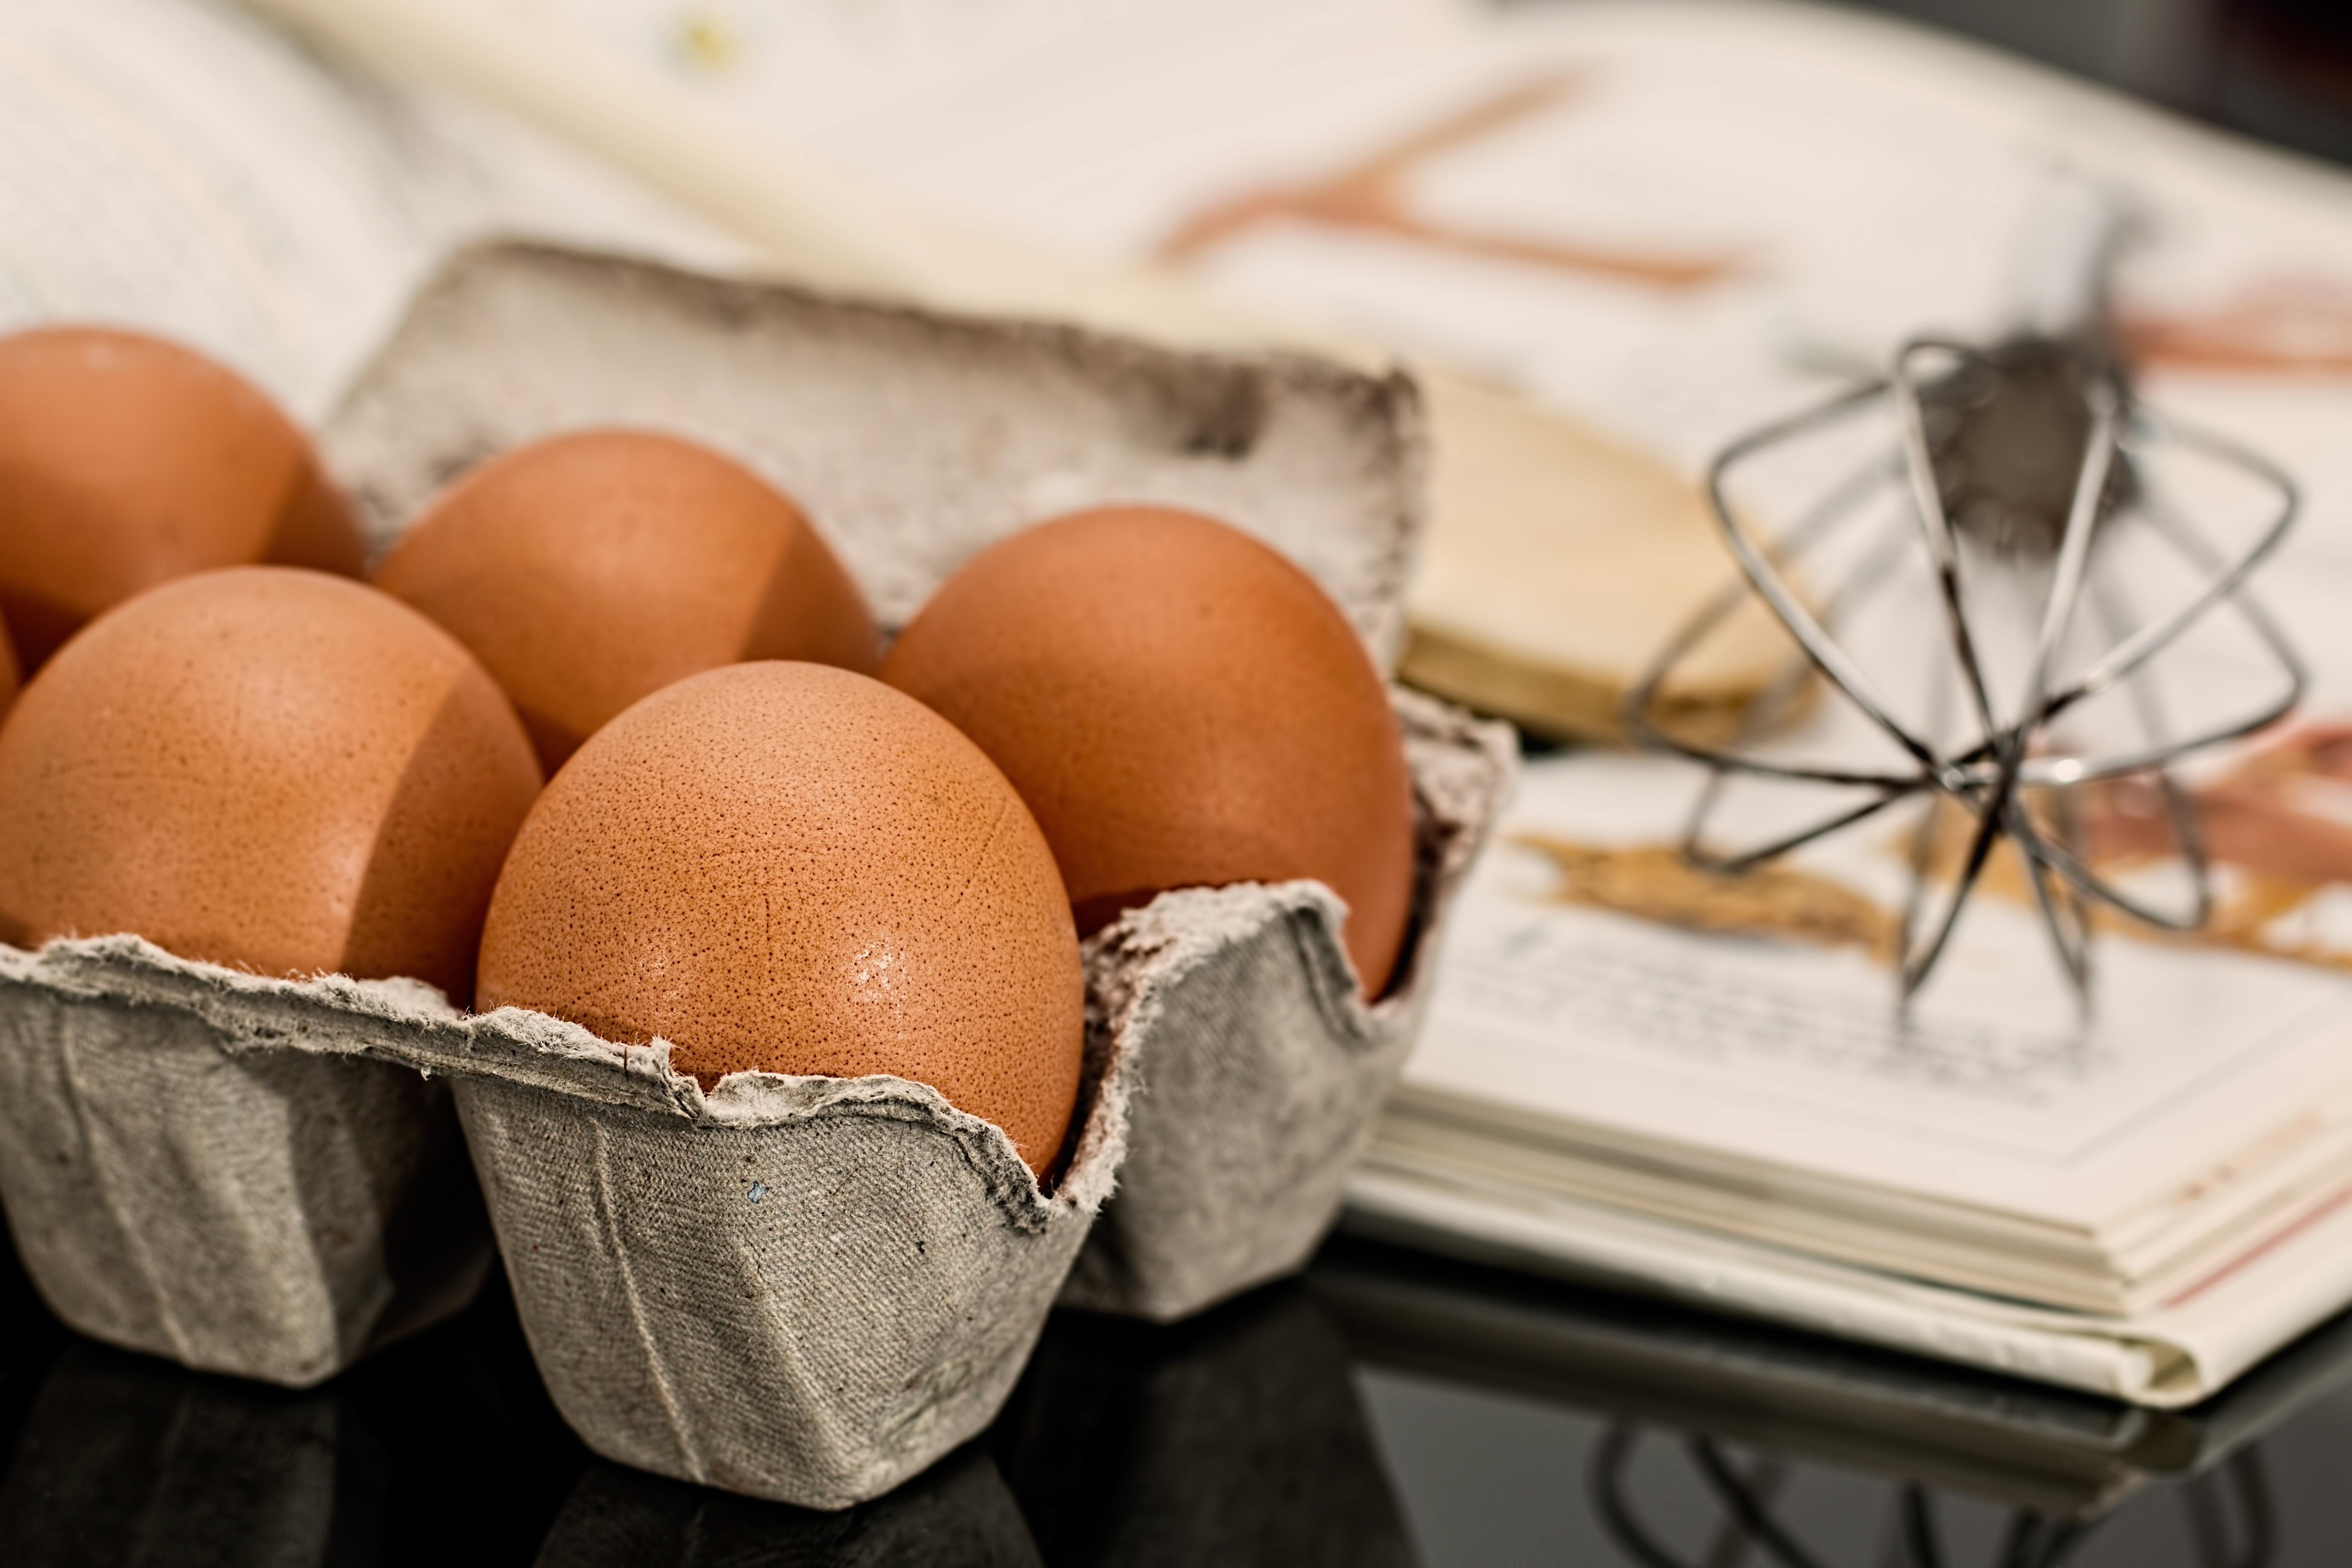 Kostenlose Foto Lebensmittel Kochen Zutat Frisch Kuche Rezept